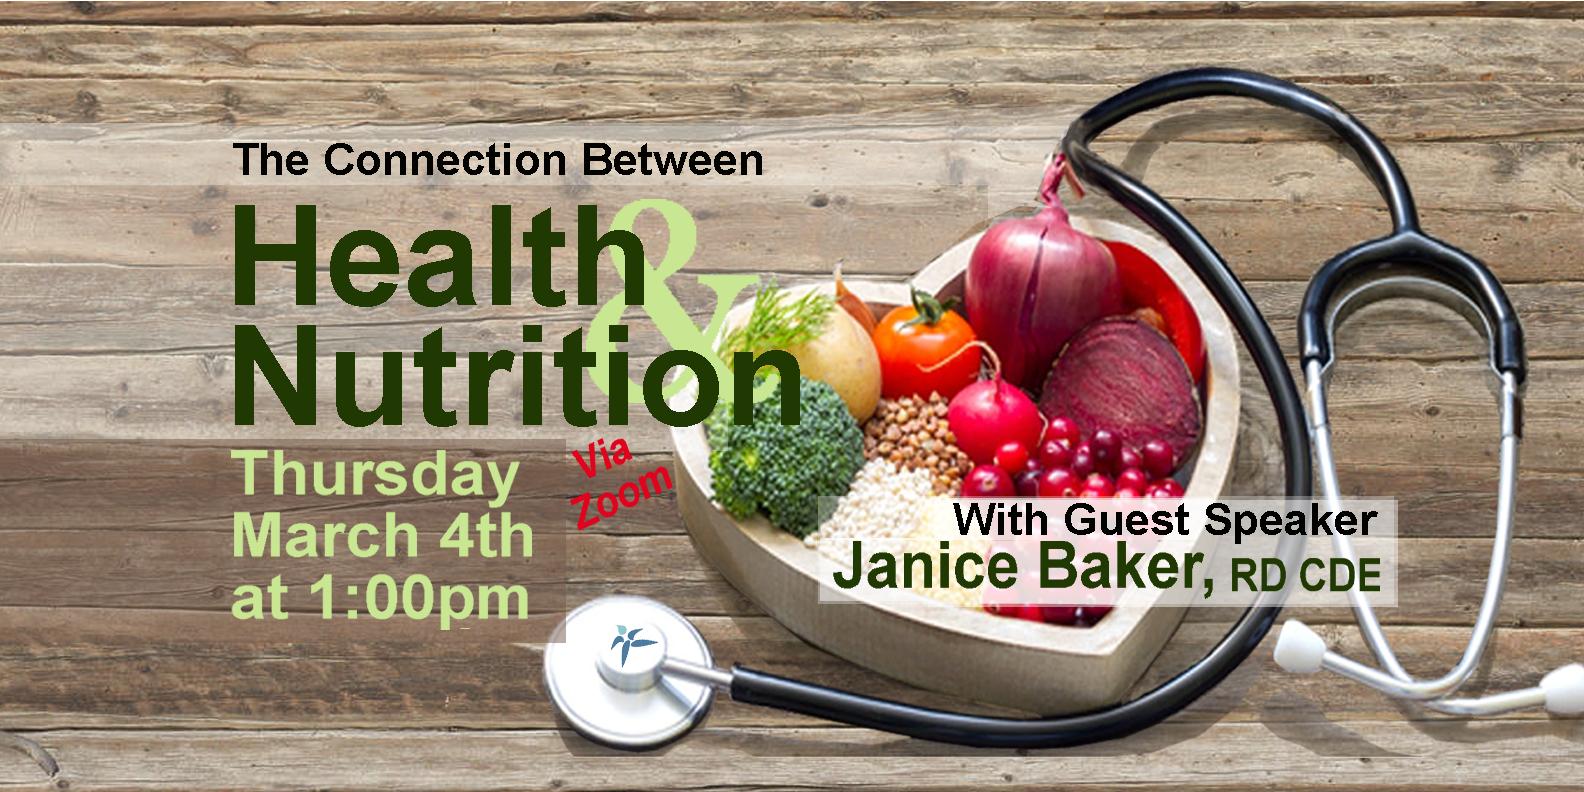 Janice Baker on Health & Nutrition